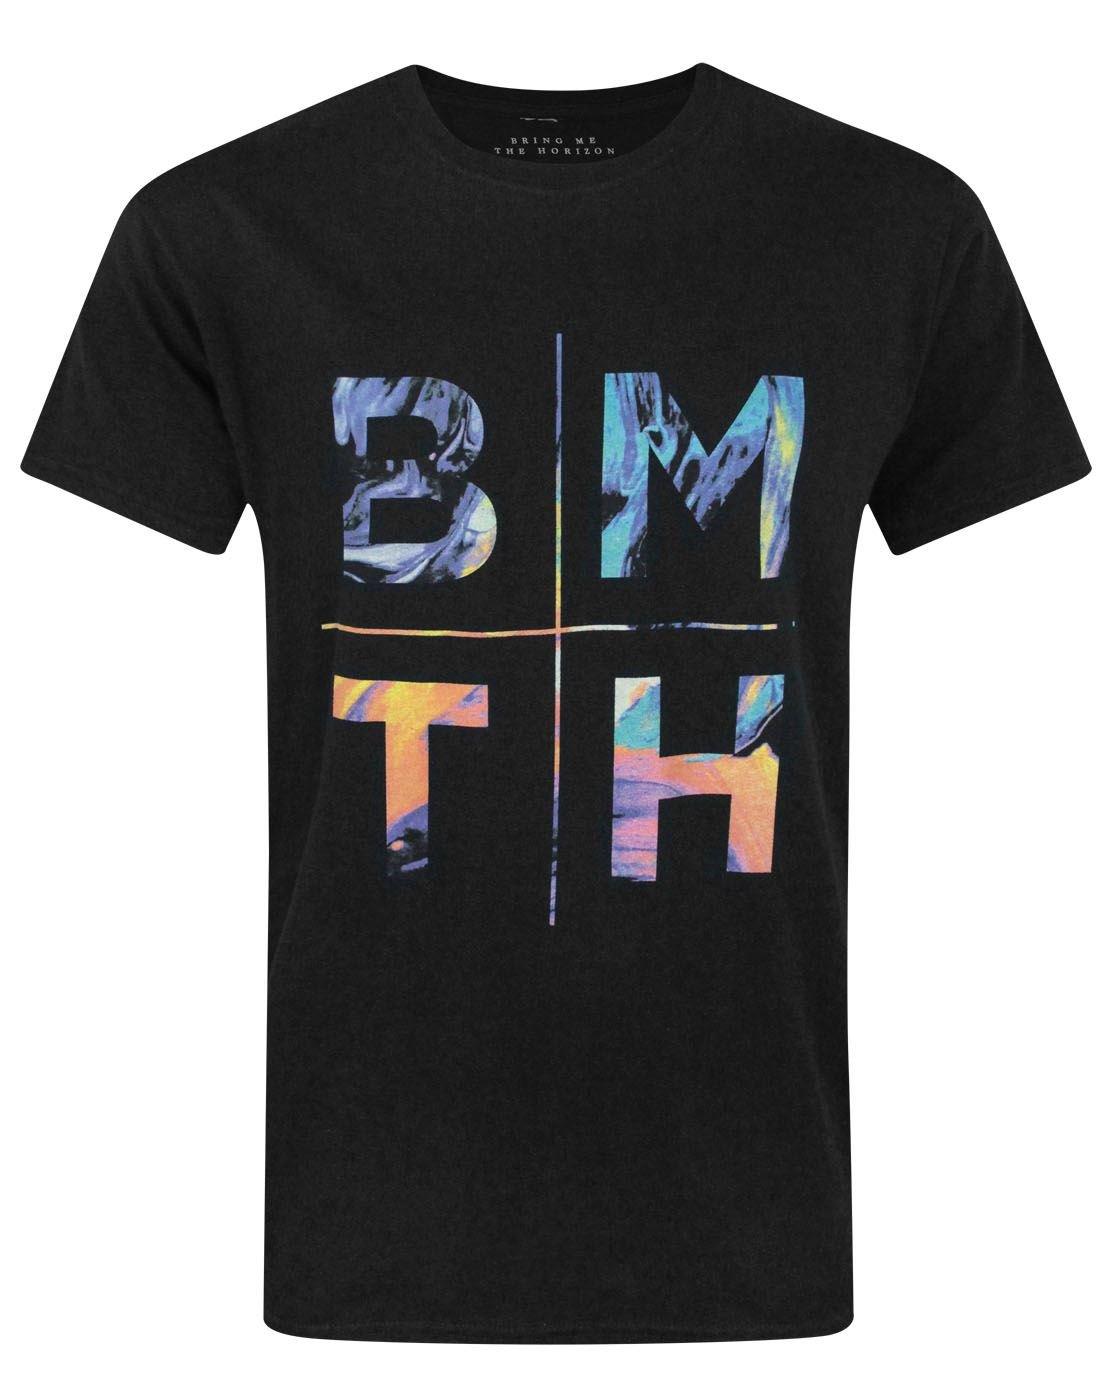 Bring Me The Horizon Colours T Shirt 4810